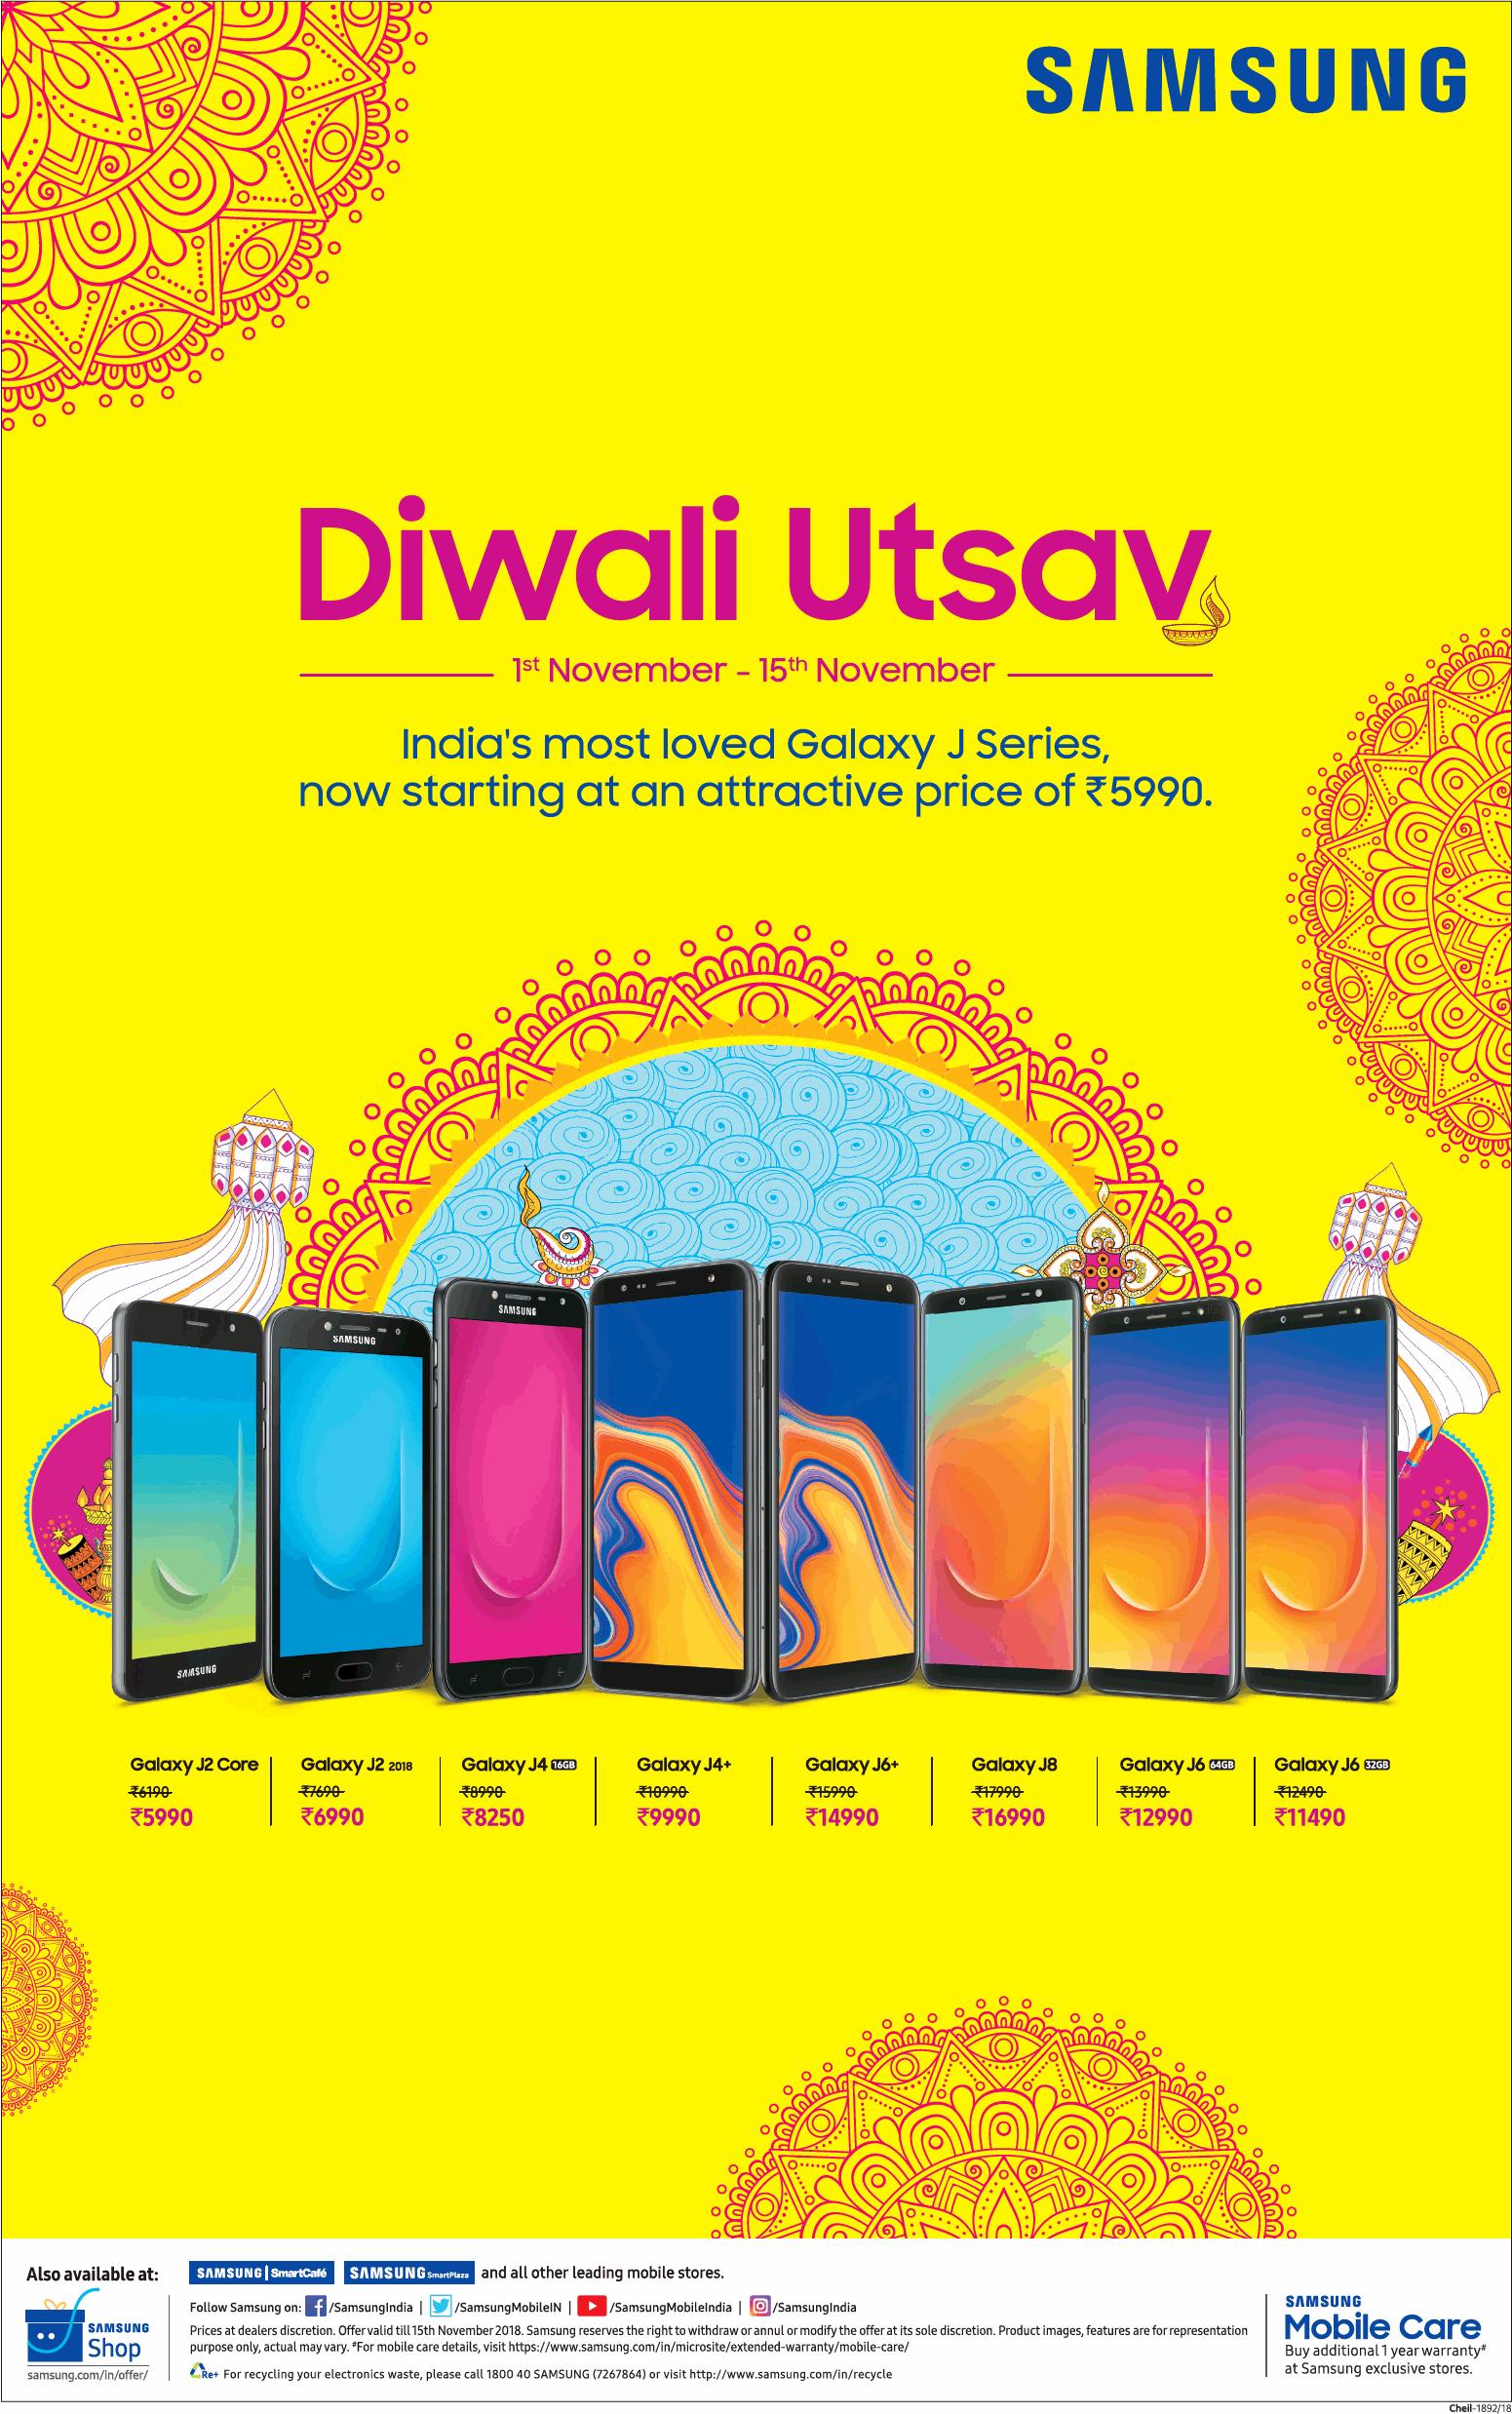 b651a35ab93 Samsung Diwali Utsav India s most loved Galaxy J Series